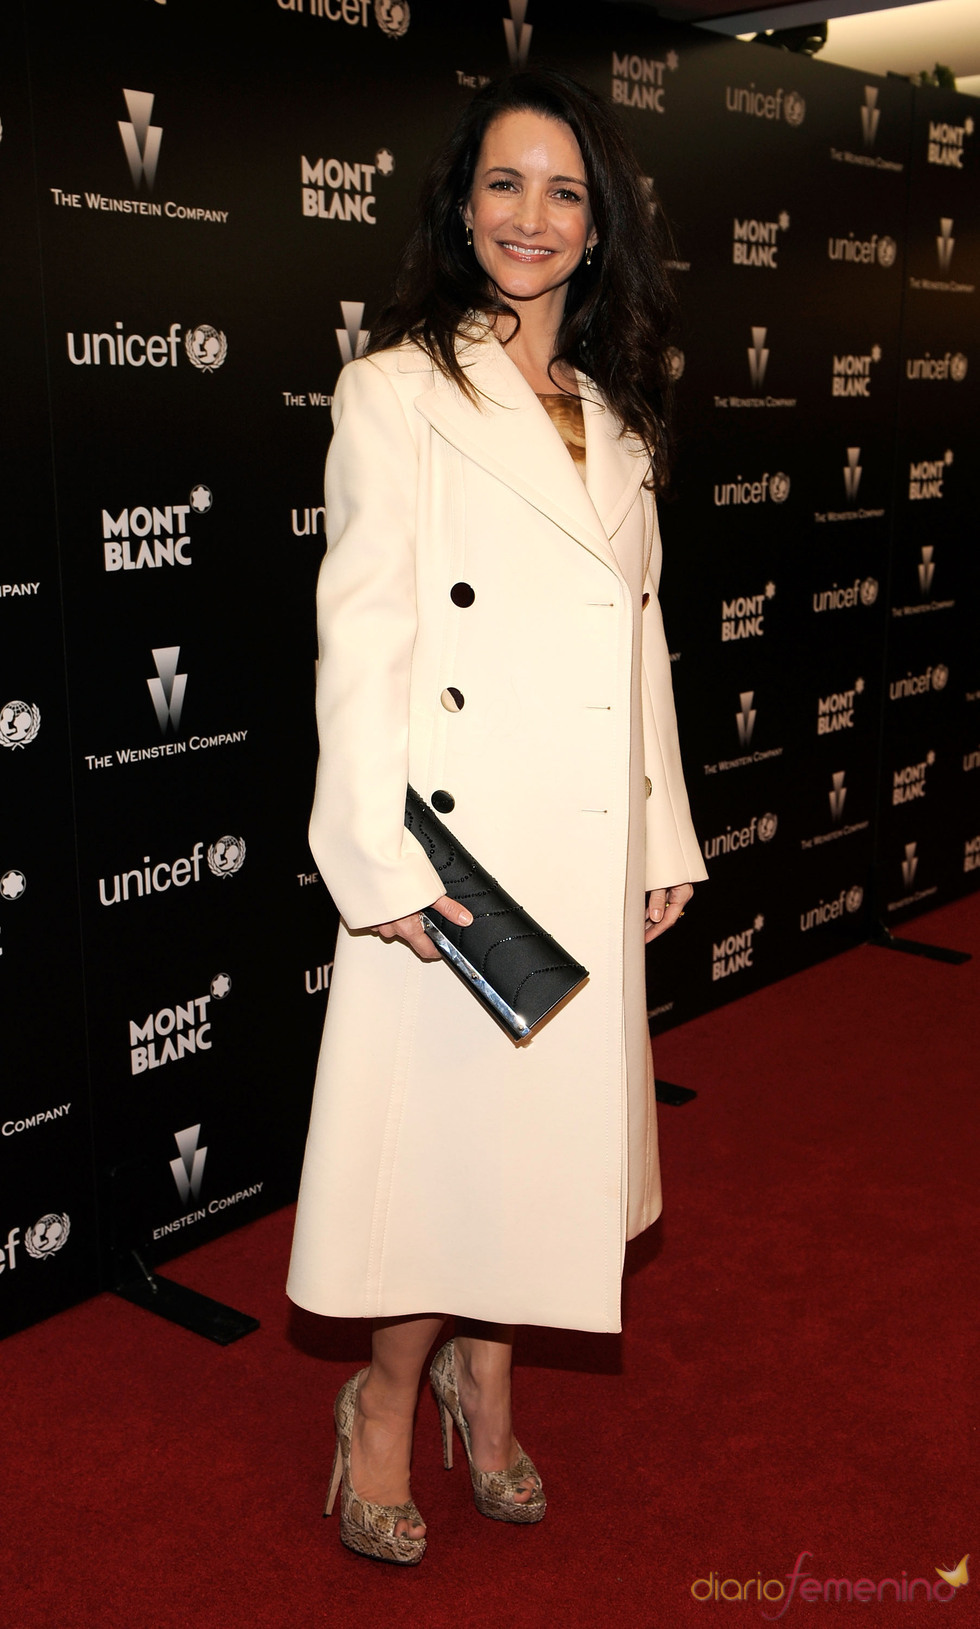 Kristin Davis en la fiesta de Unicef previa a los Oscars